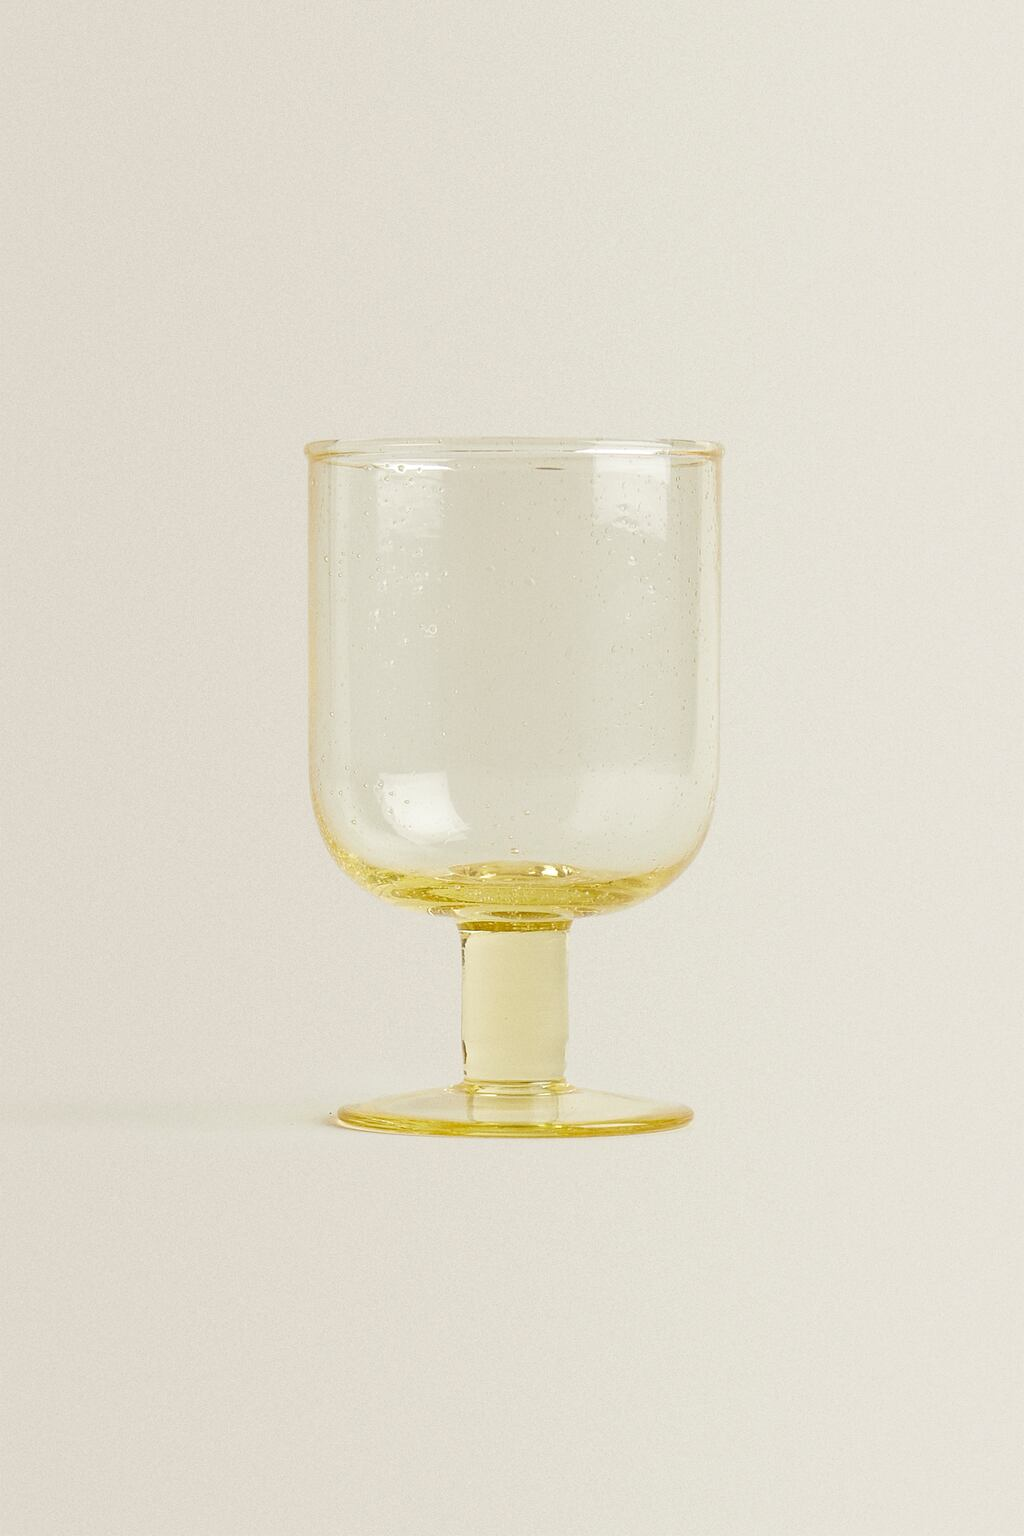 BUBBLES WINE GLASS from Zara